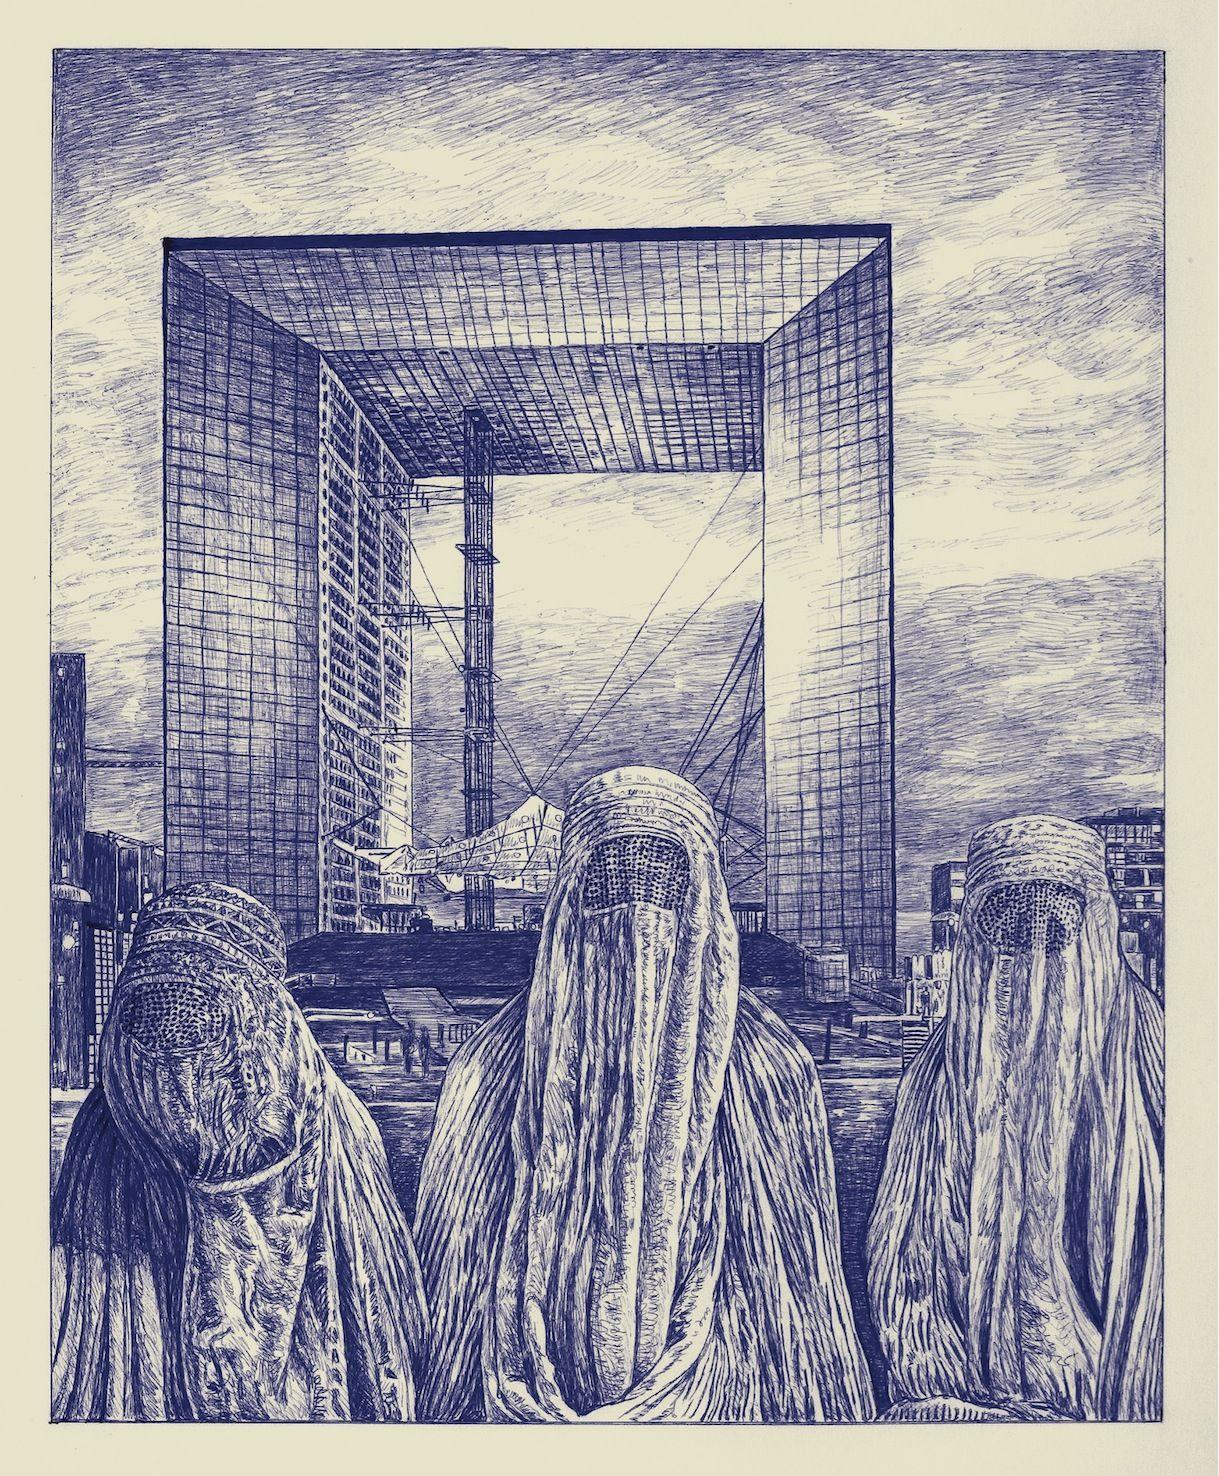 Andrea Zucchi, Parigi, 2009, penna a sfera su carta pergamena, cm 37x40.